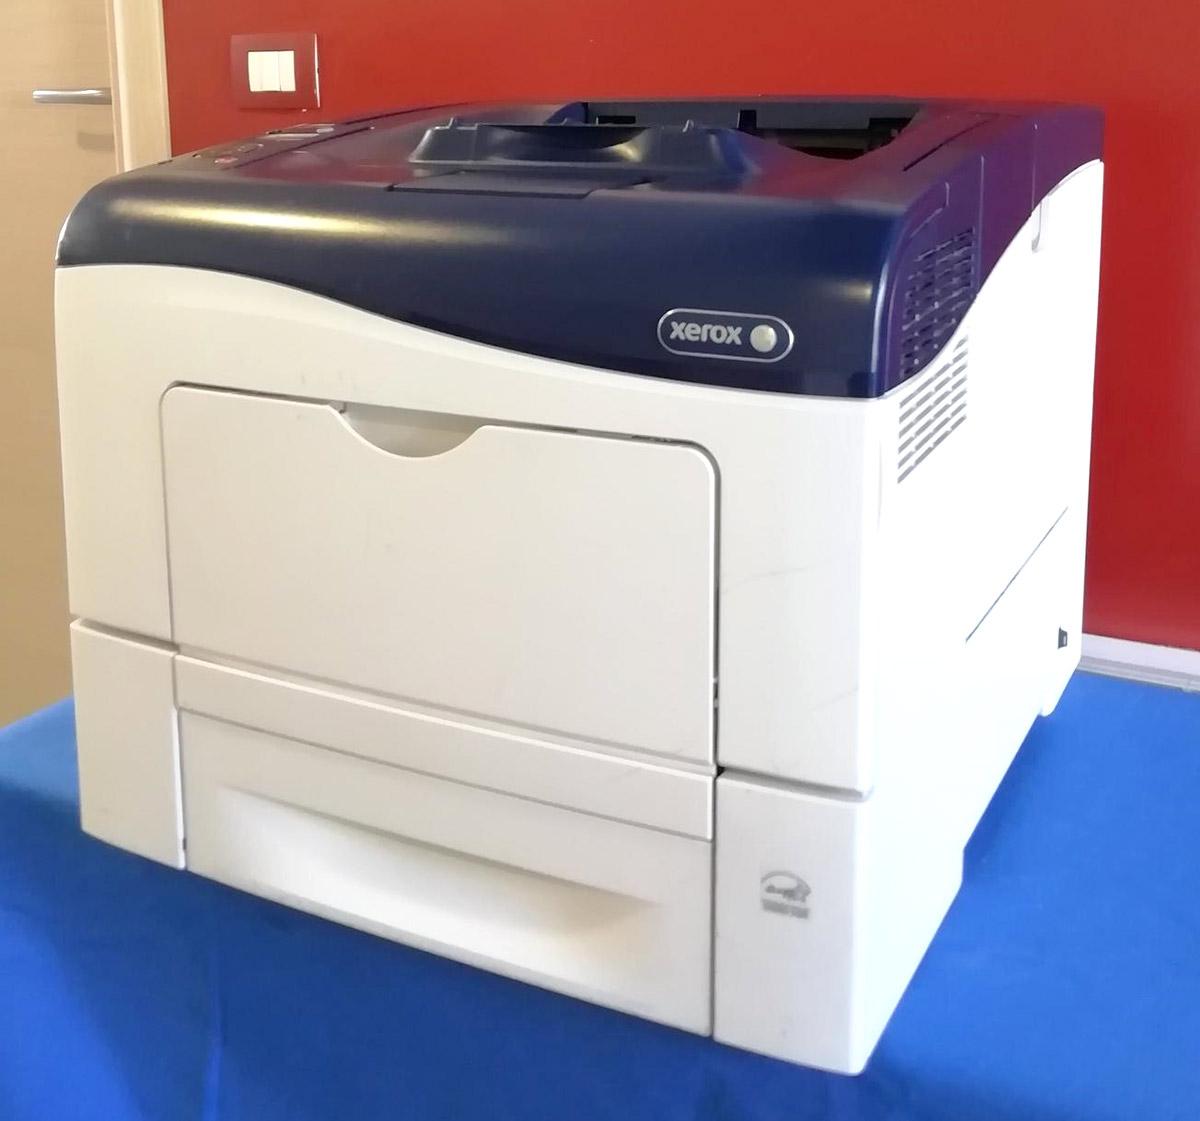 Xerox Phaser 6600 - Usato garantito Xerox - Lato